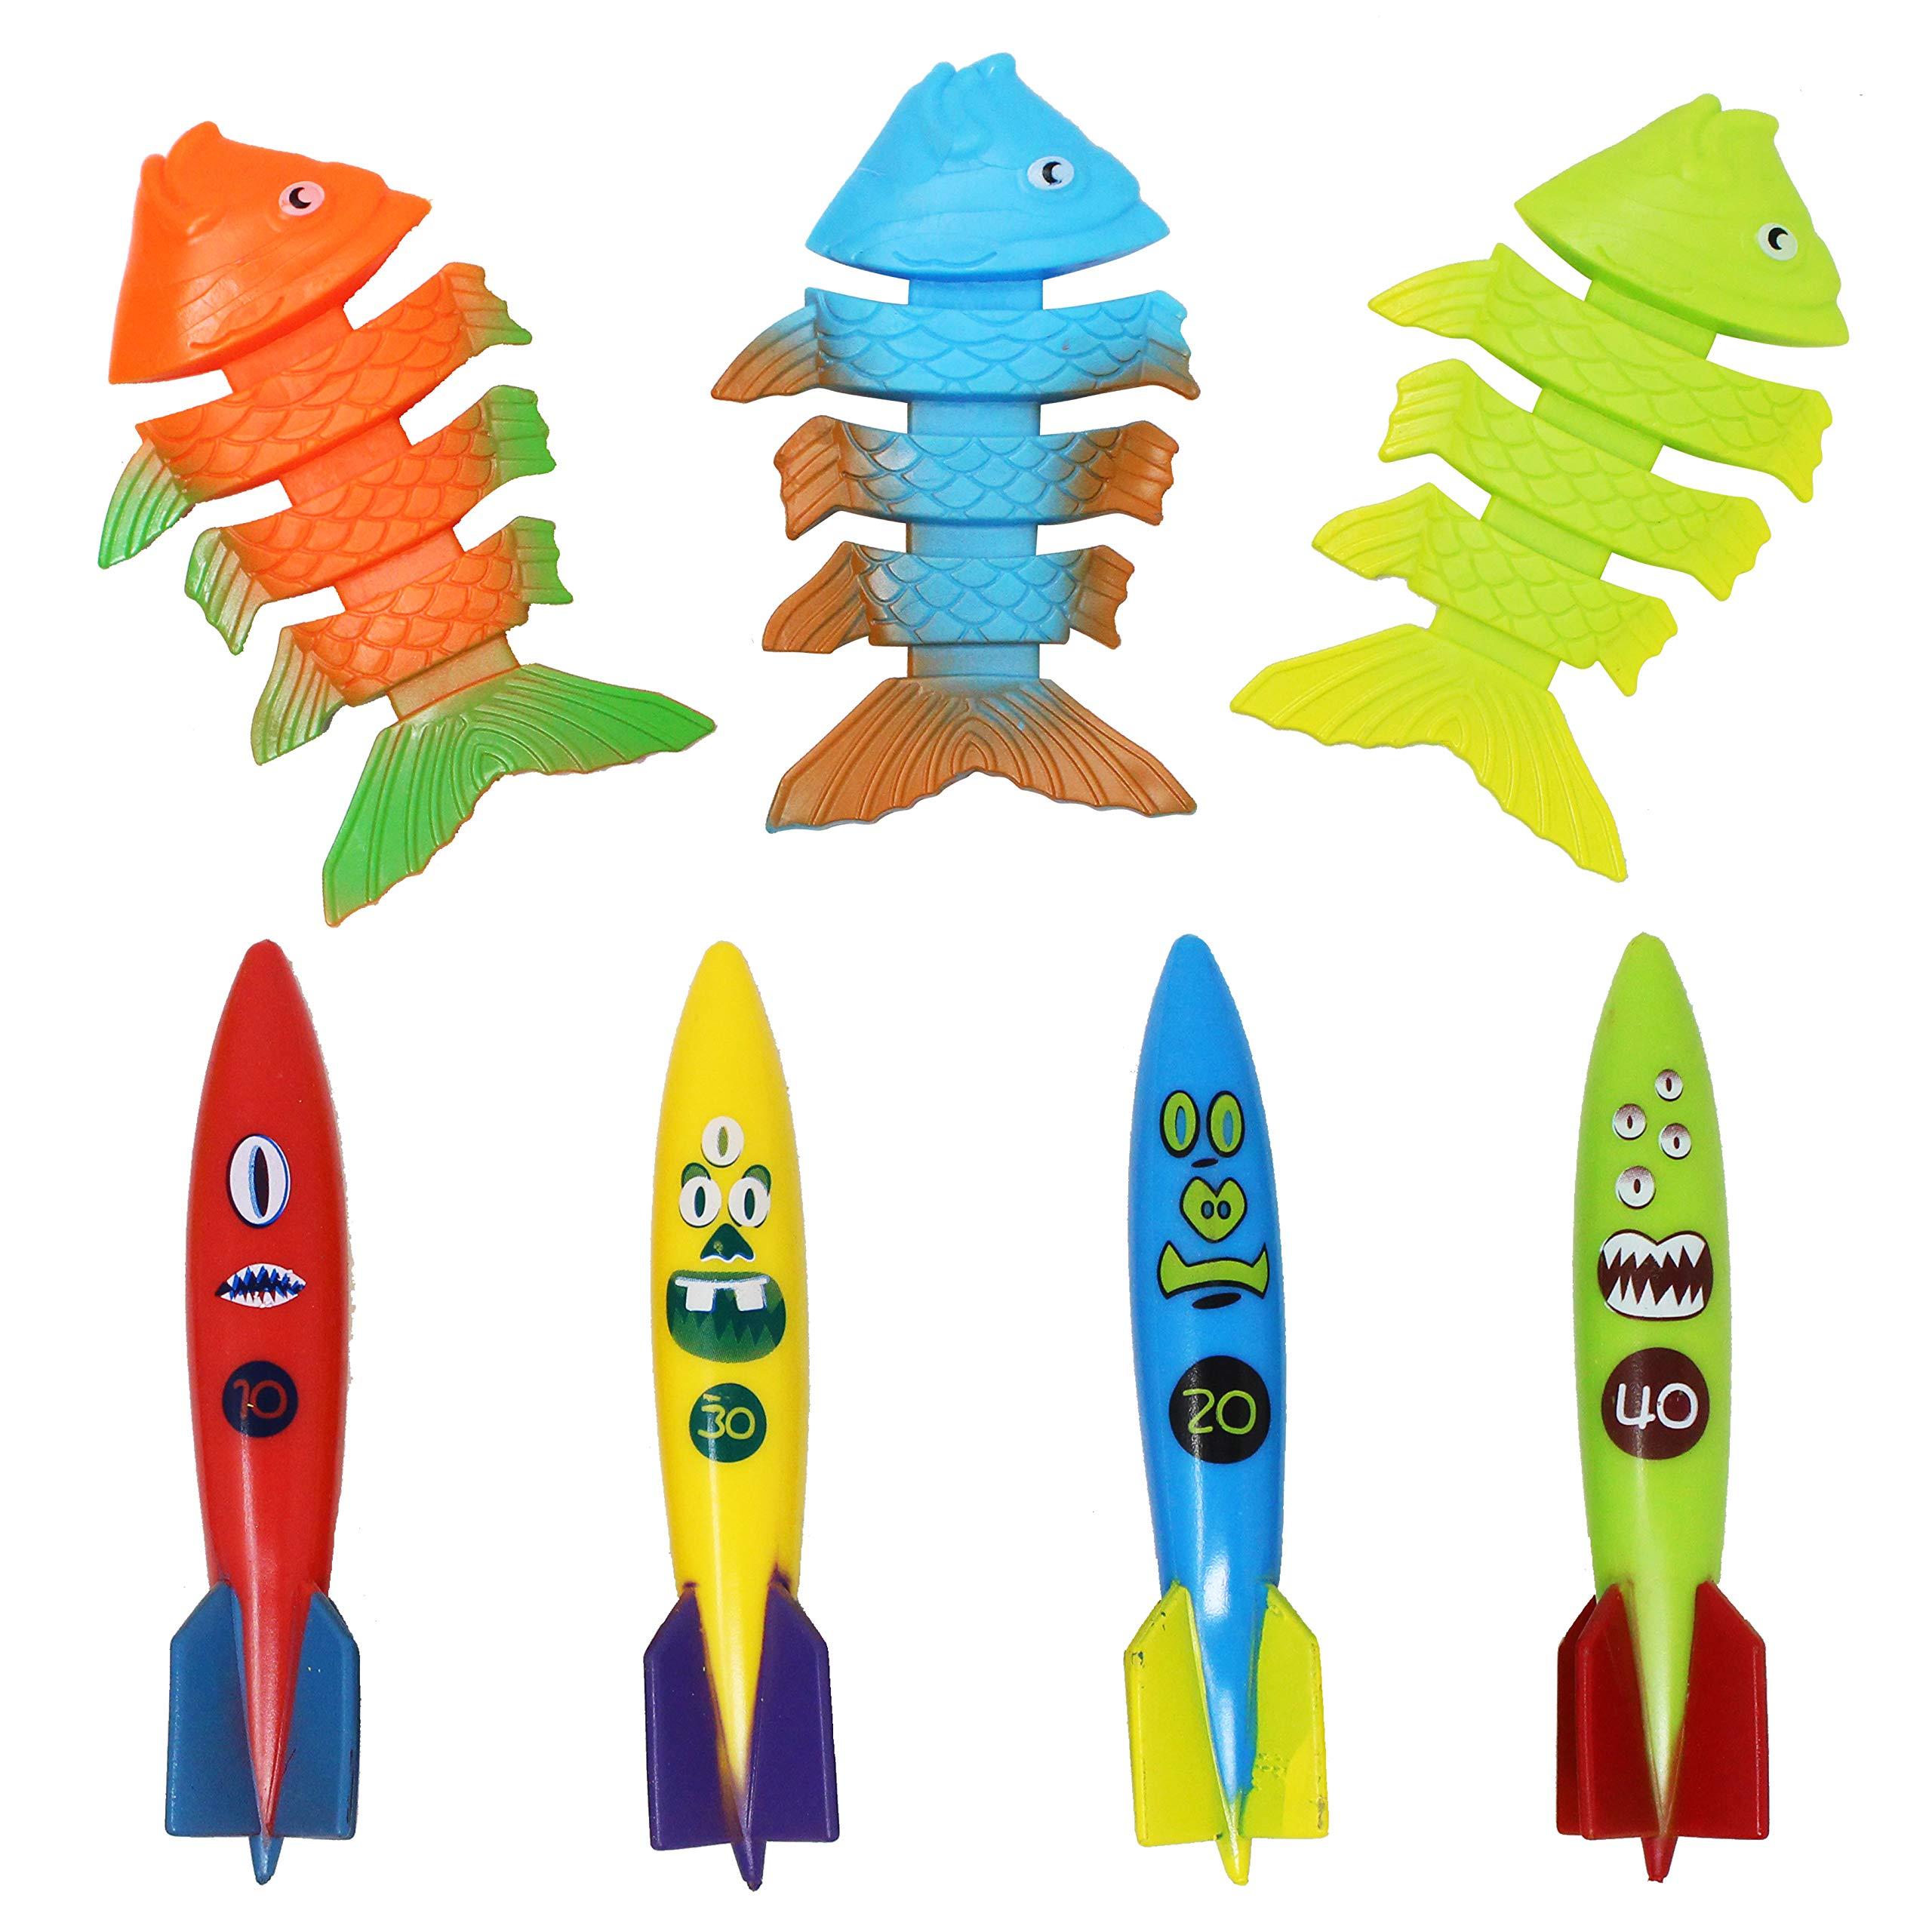 JOYIN 30 Pcs Diving Pool Toys Jumbo Set Includes (5) Diving Sticks, (6) Diving Rings, (5) Pirate Treasures, (4) Toypedo Bandits, (3) Diving Toy Balls, (3) Fish Toys, (4) Stringy Octopus by JOYIN (Image #7)